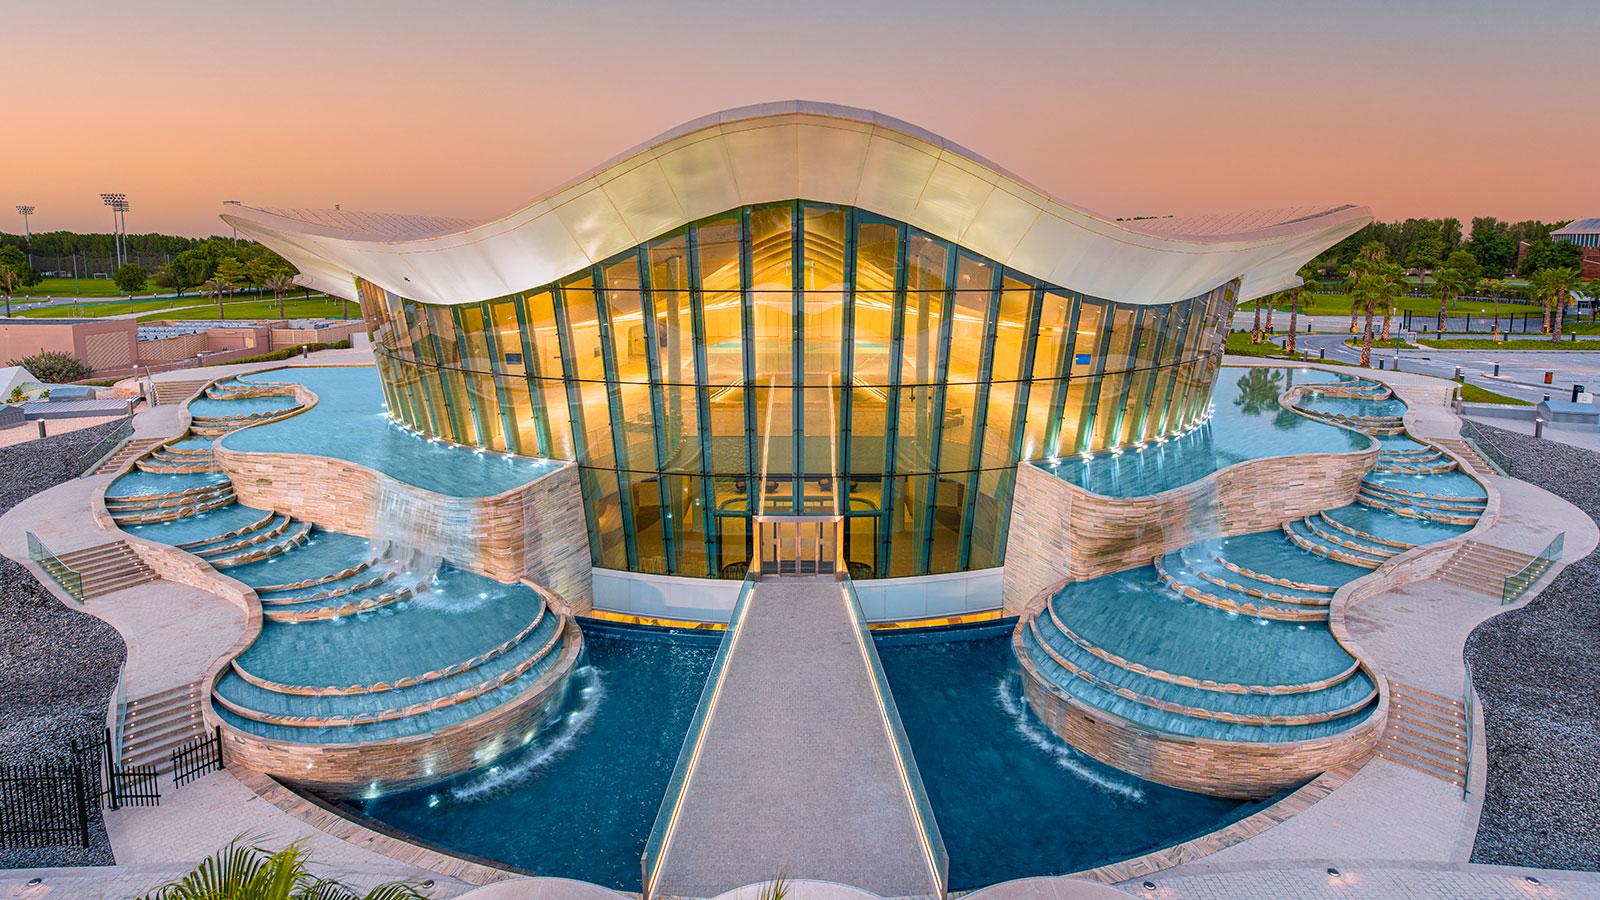 World's deepest pool opens in Dubai, part of huge underwater city | CNN  Travel